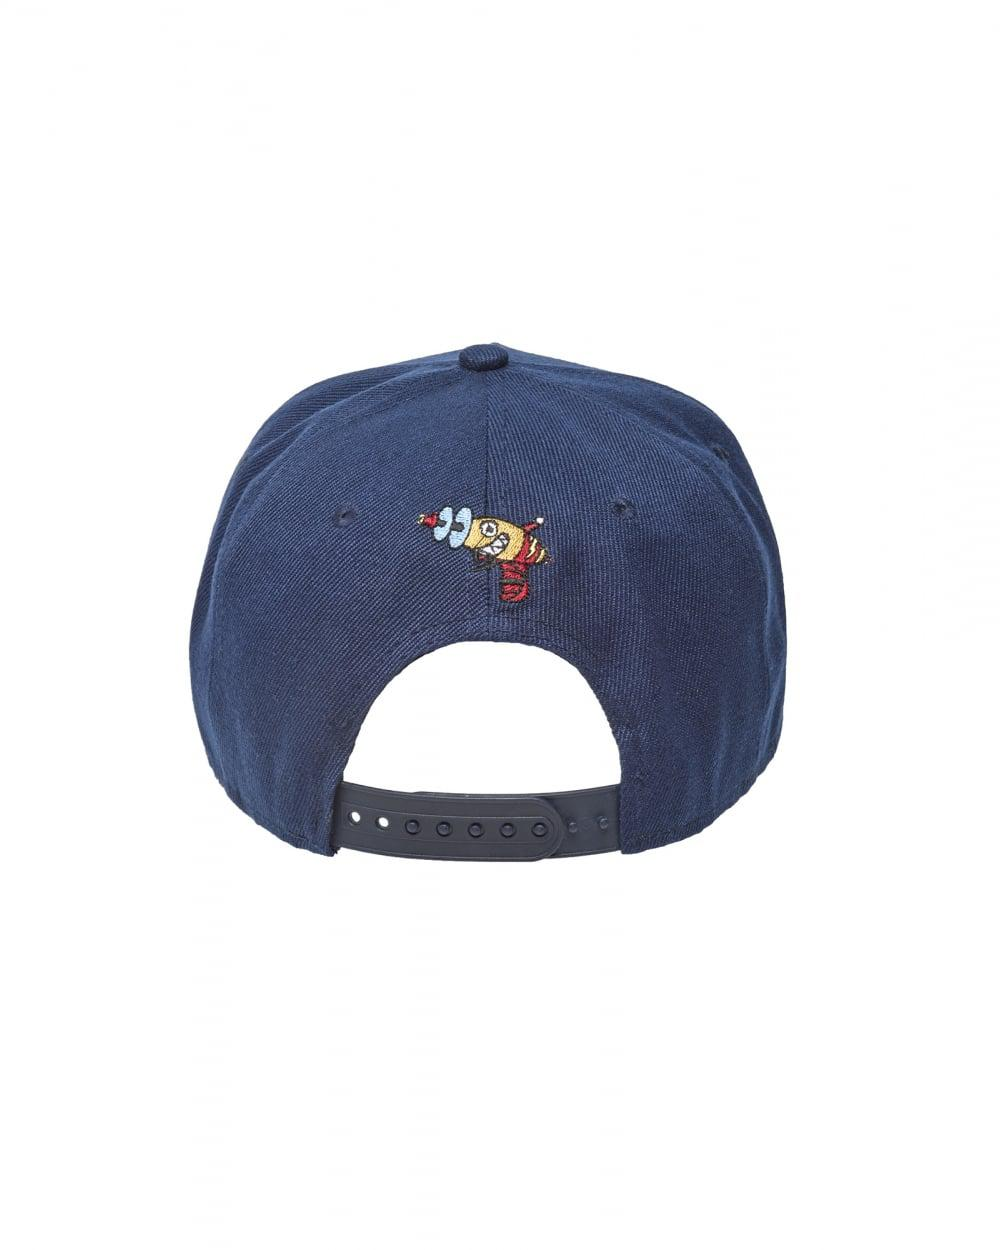 b99398f85a4 Lyst - BBCICECREAM Snapback Cap